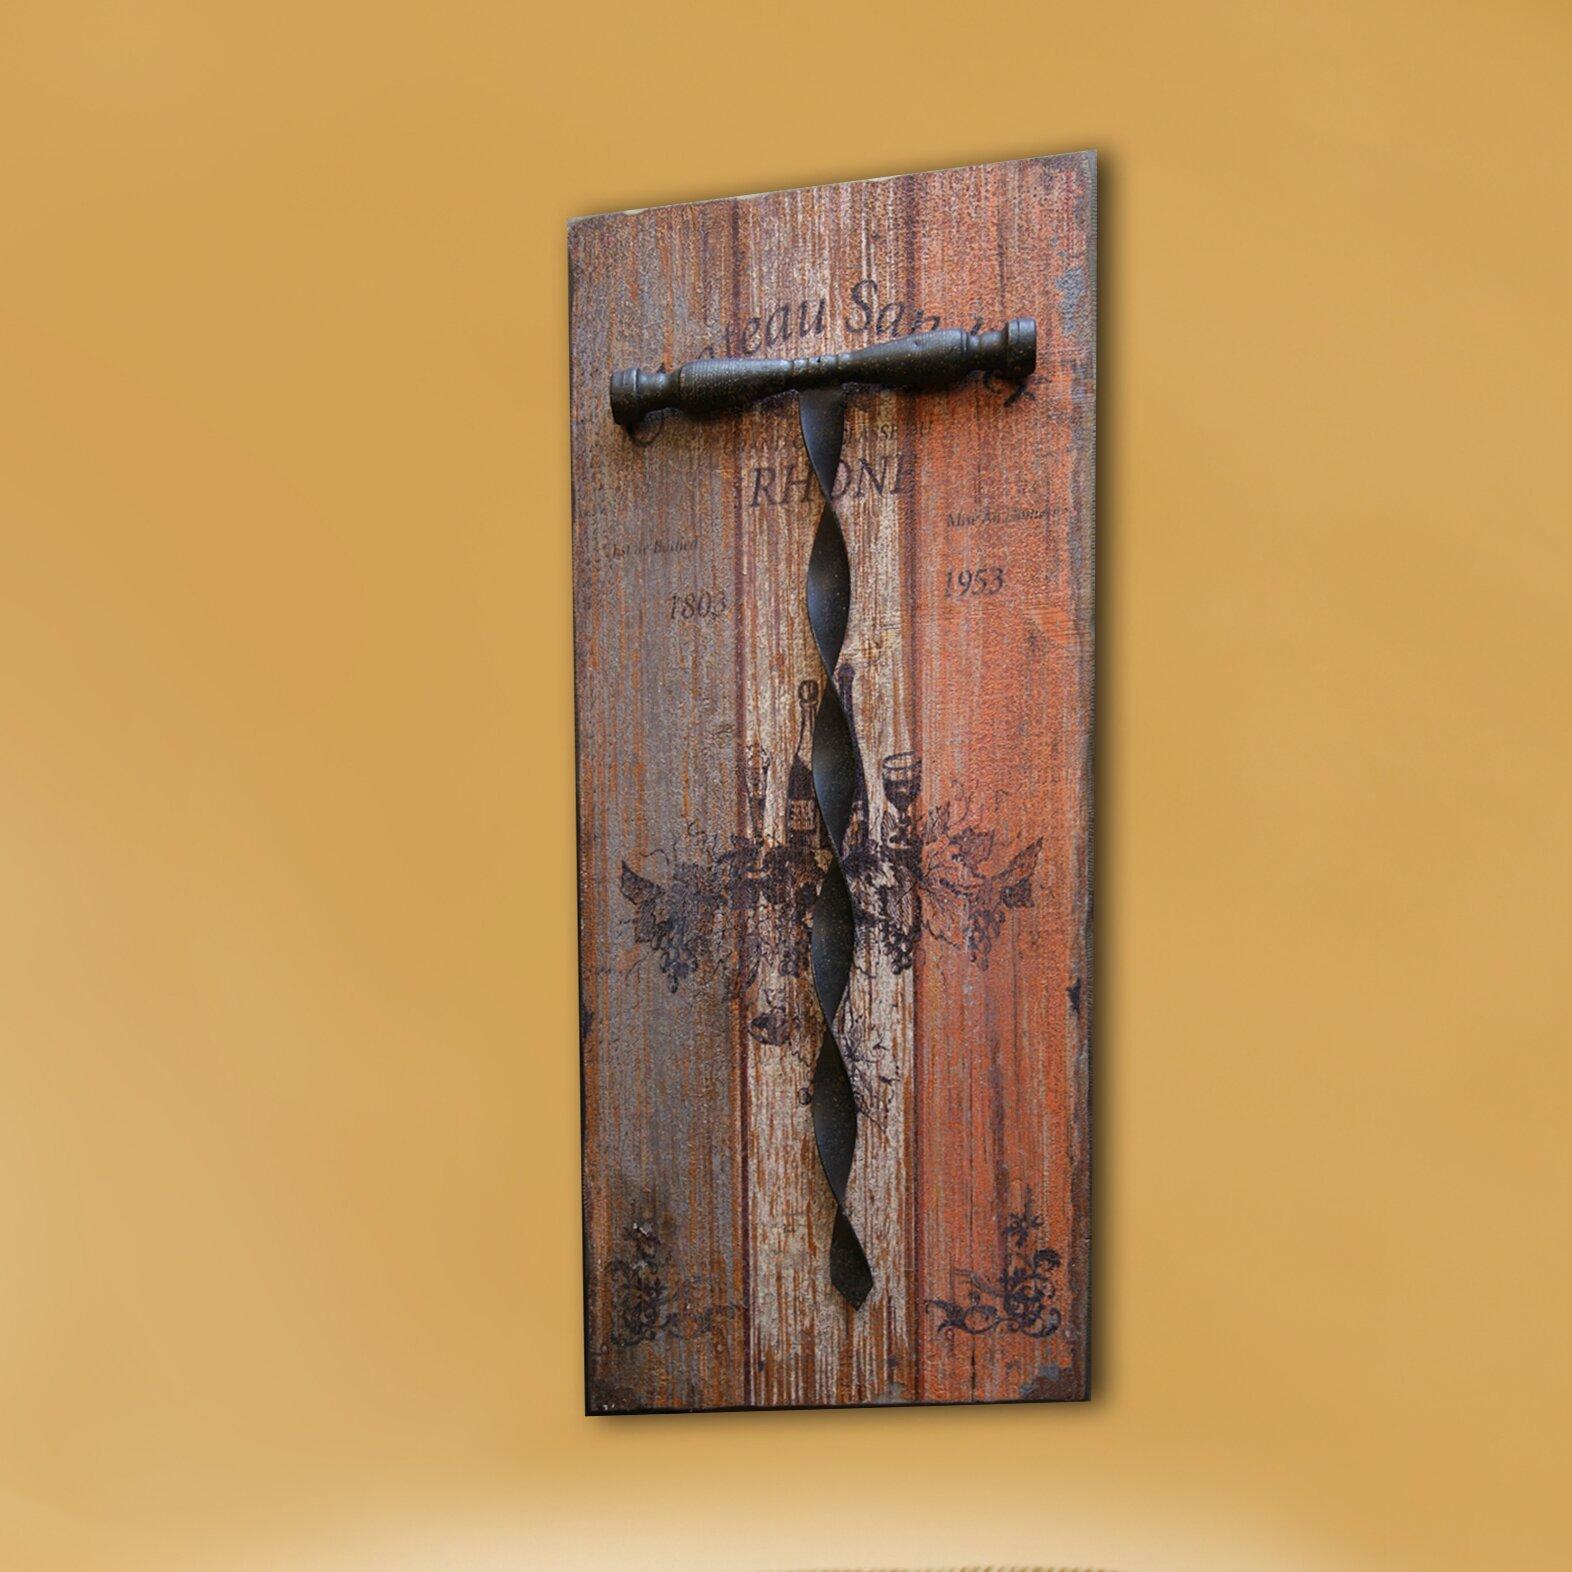 Hdc international cork screw wall decor reviews for International wall decor